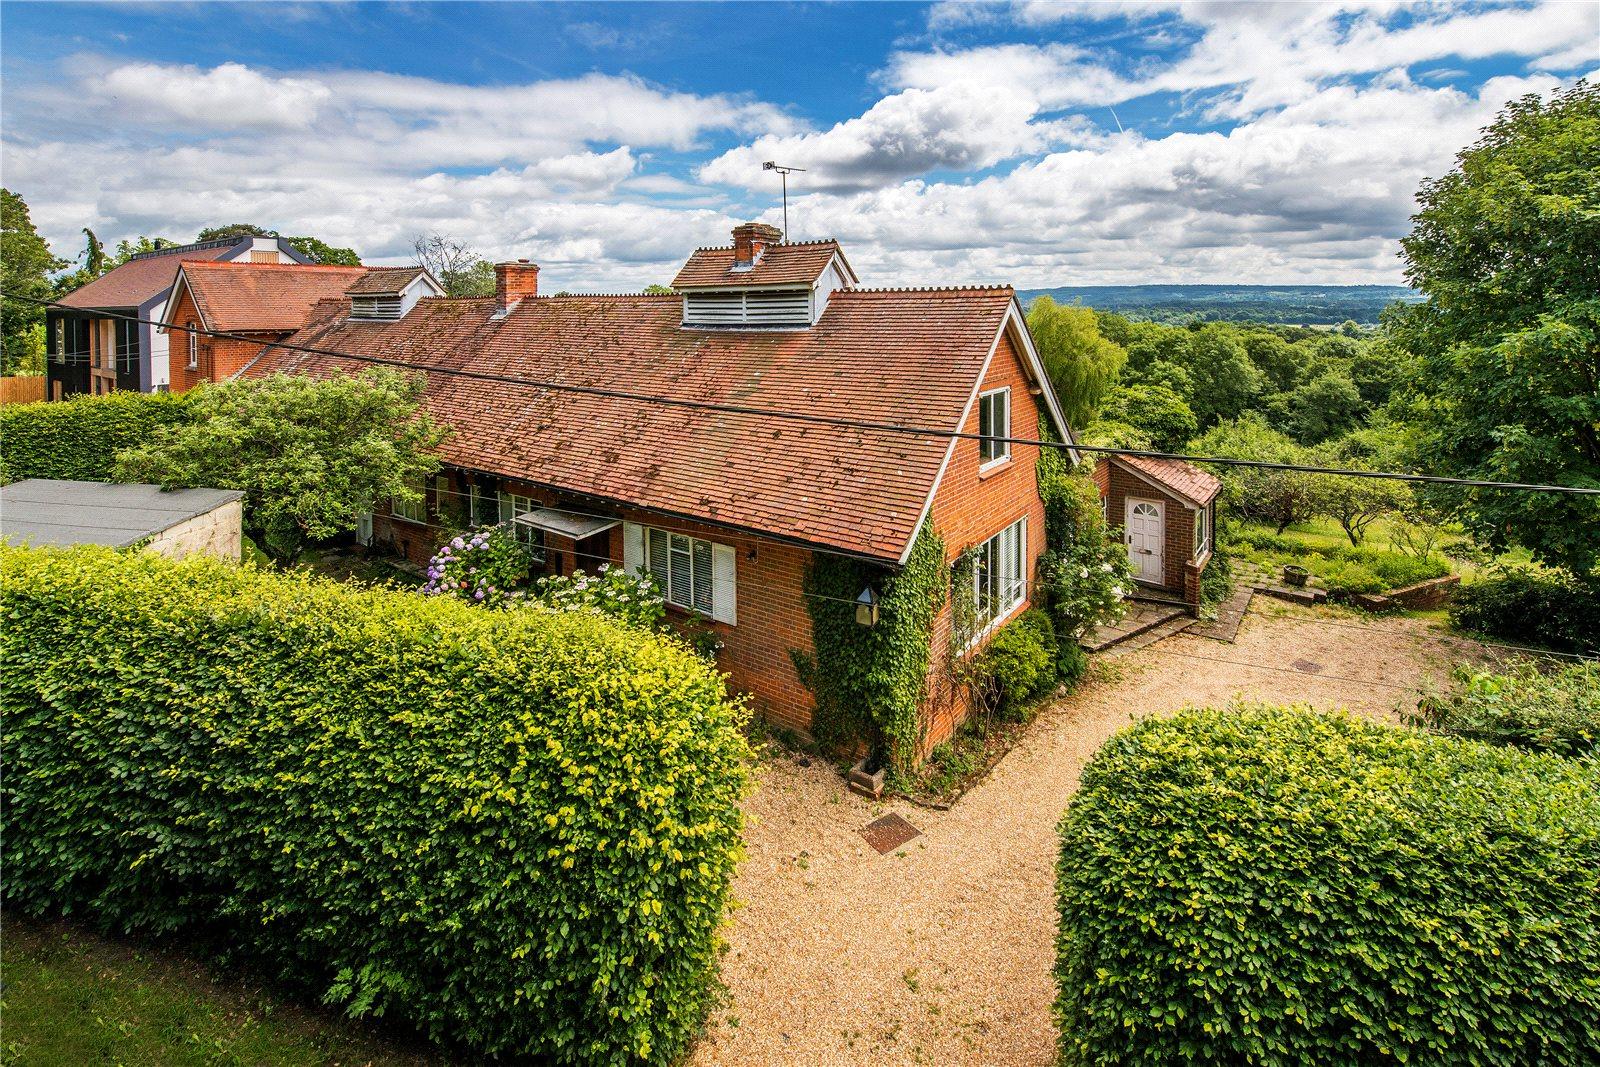 独户住宅 为 销售 在 Summerfield Lane, Frensham, Farnham, Surrey, GU10 Farnham, 英格兰